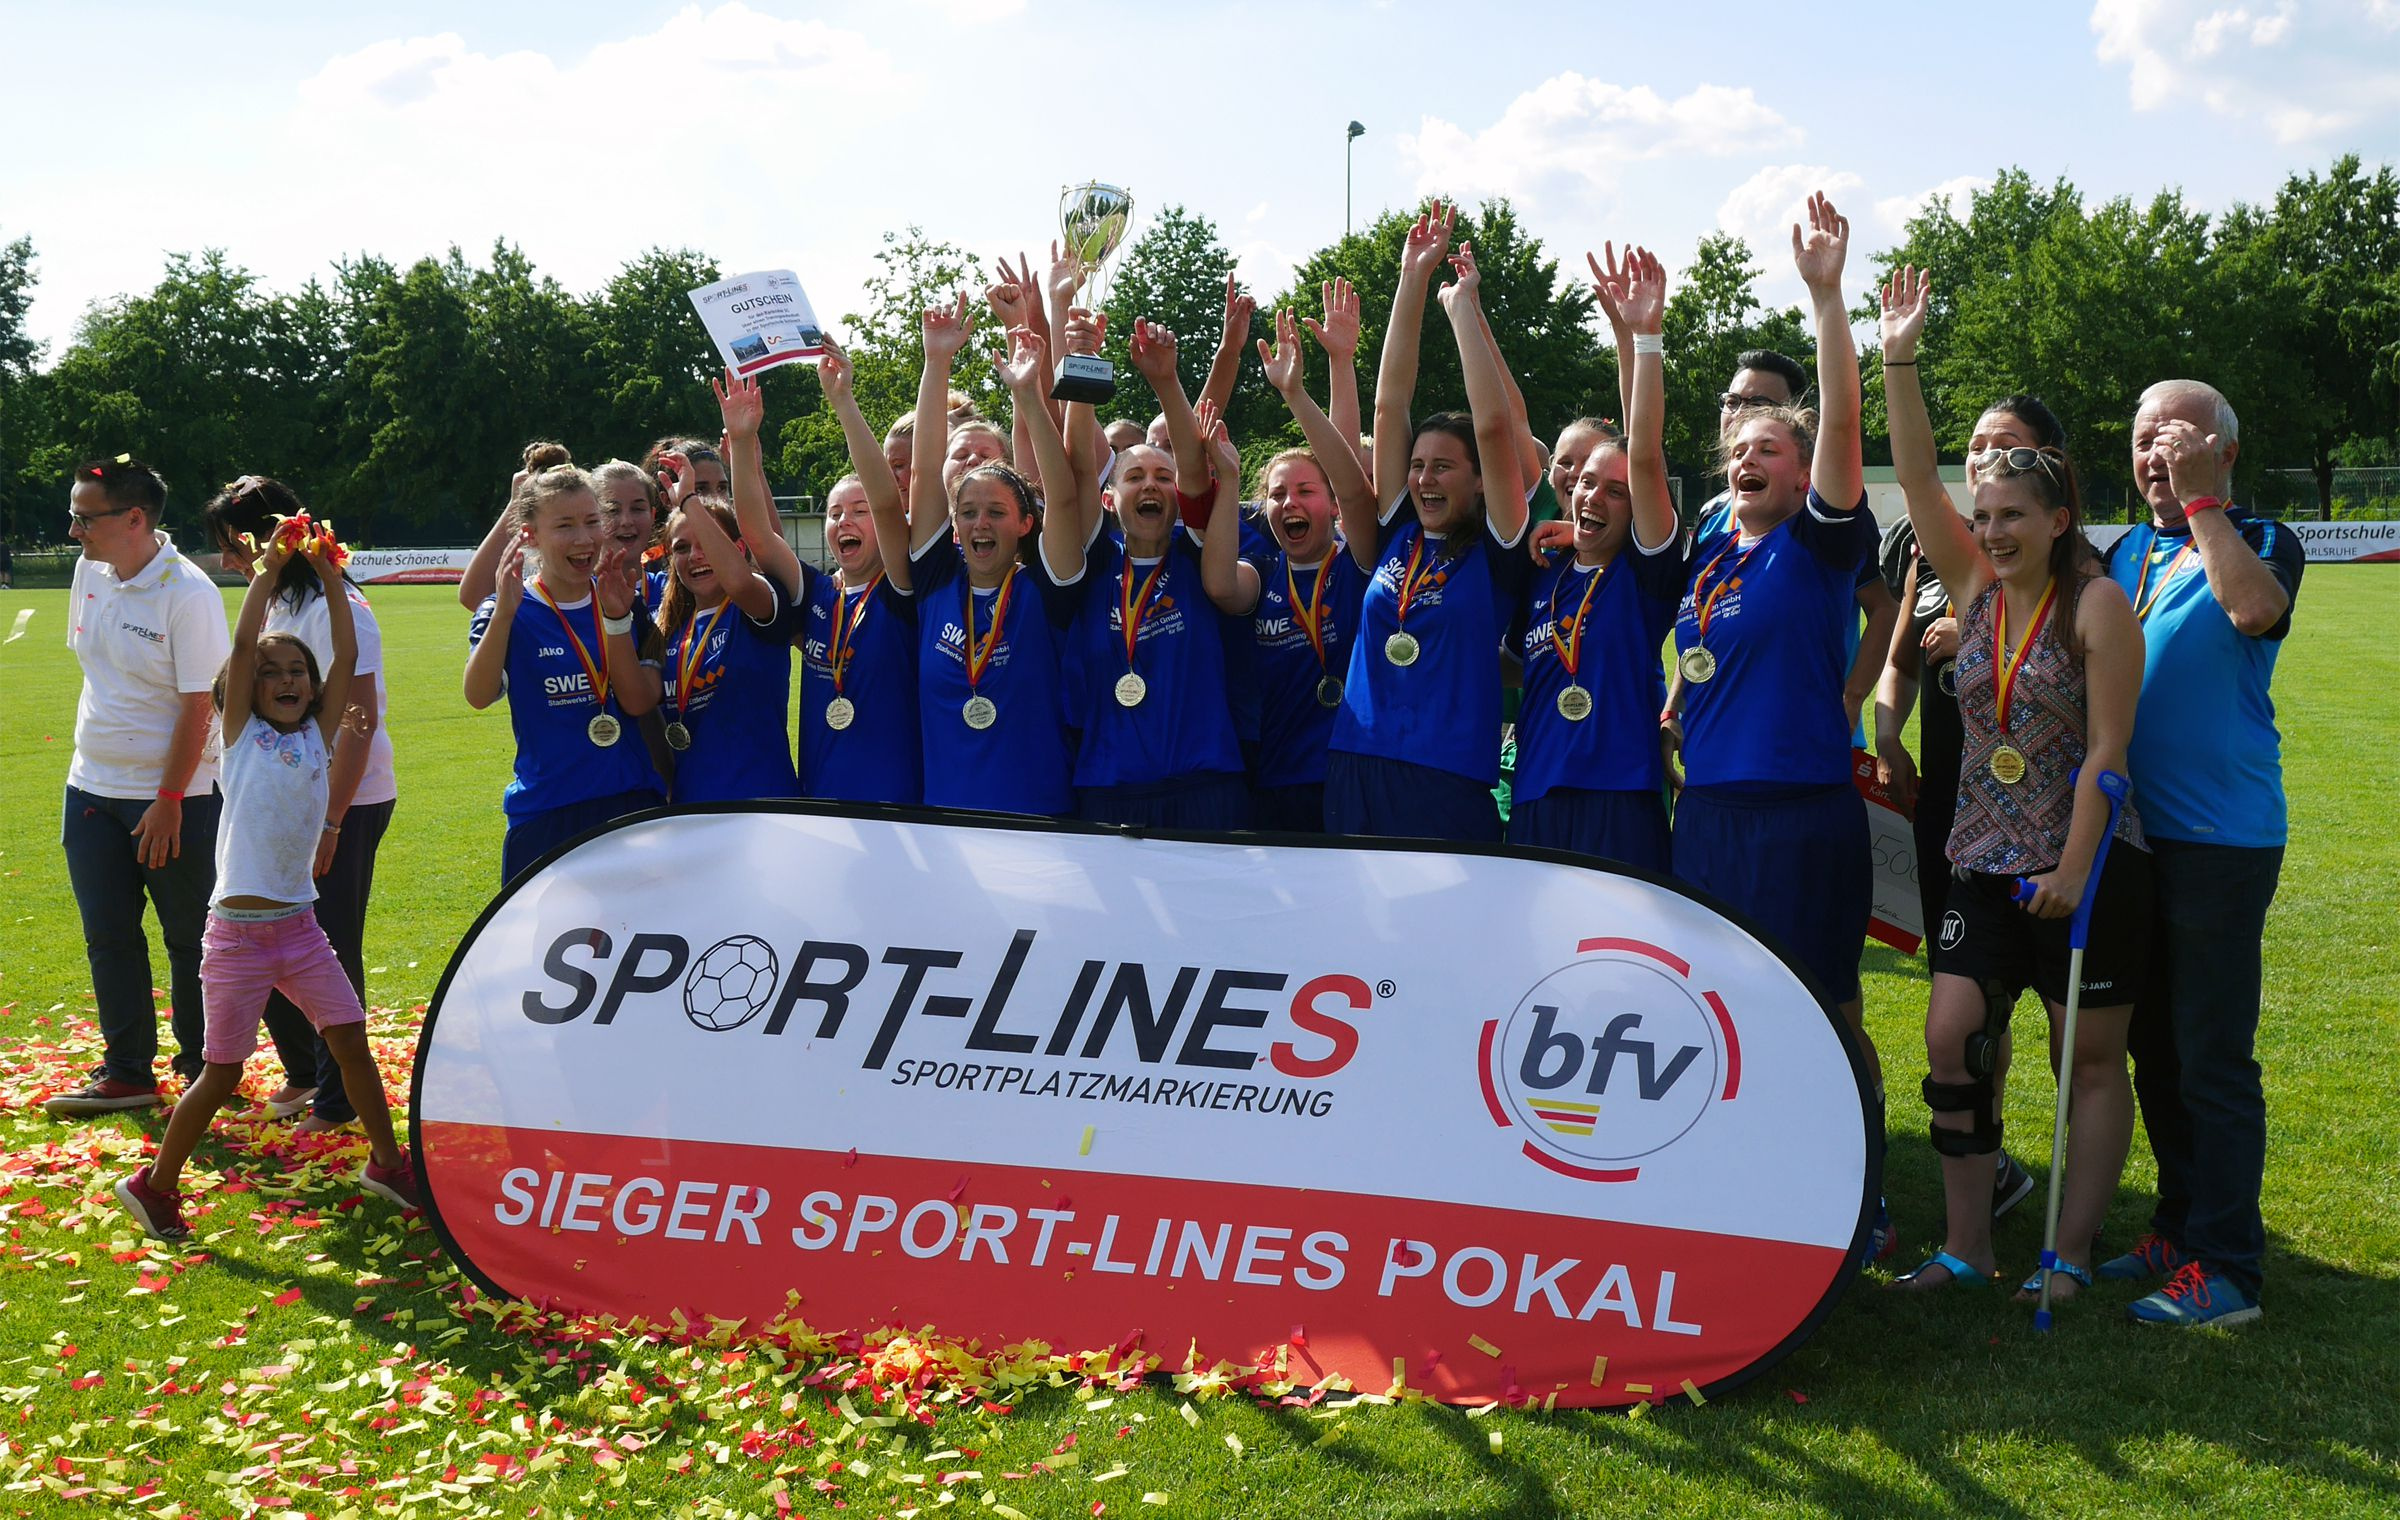 So sehen Siegerinnen aus! Glückwunsch an den Karlsruher SC!